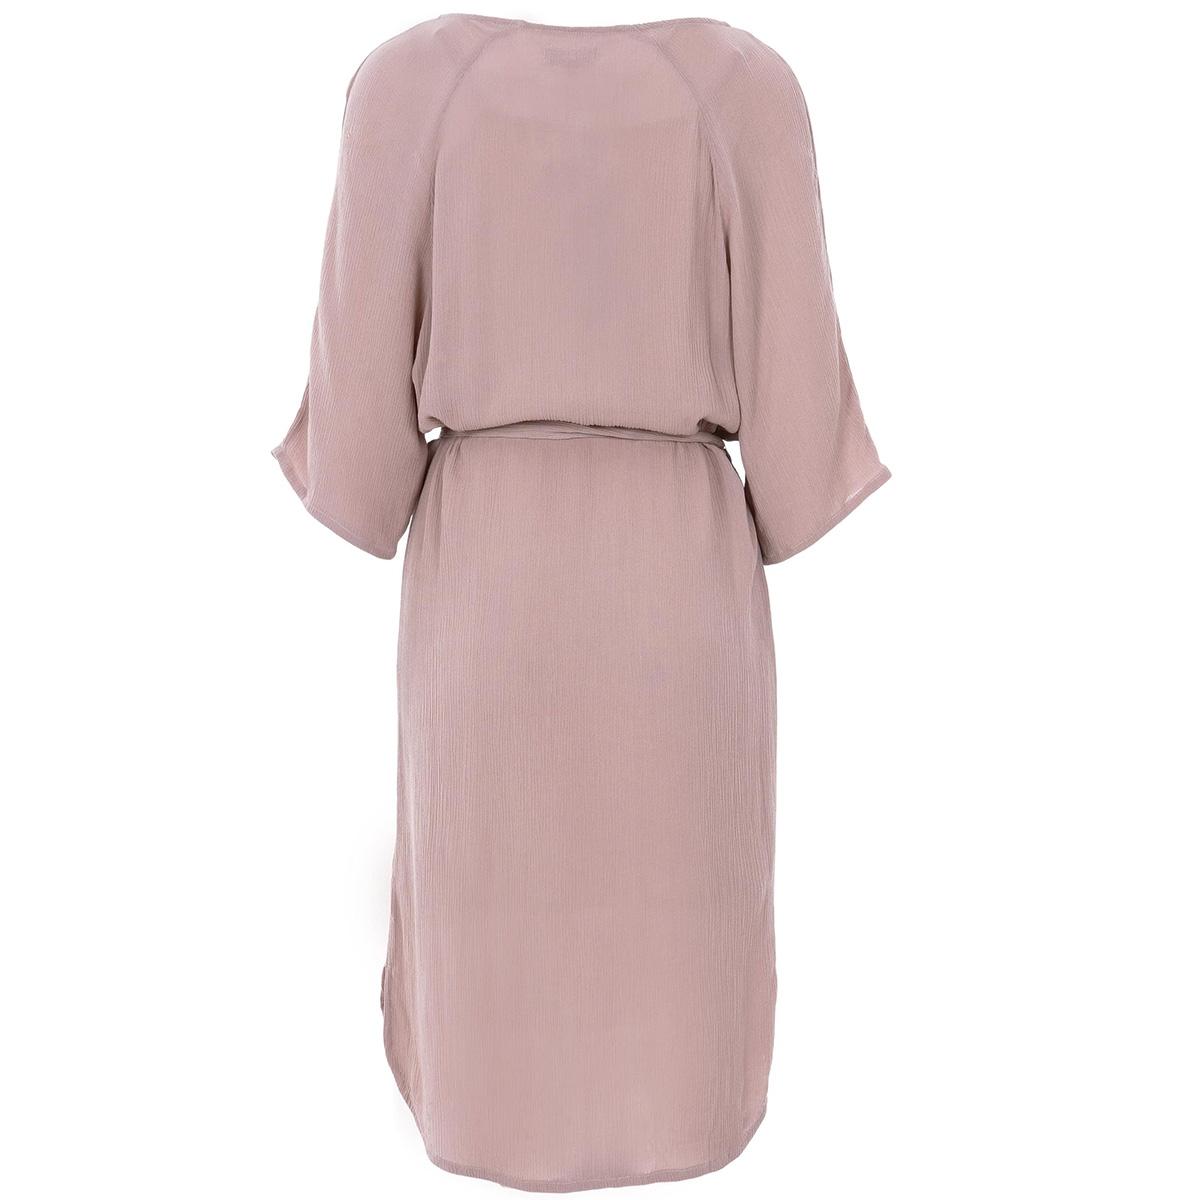 nonchalante jurk met ceintuur zusss jurk lila